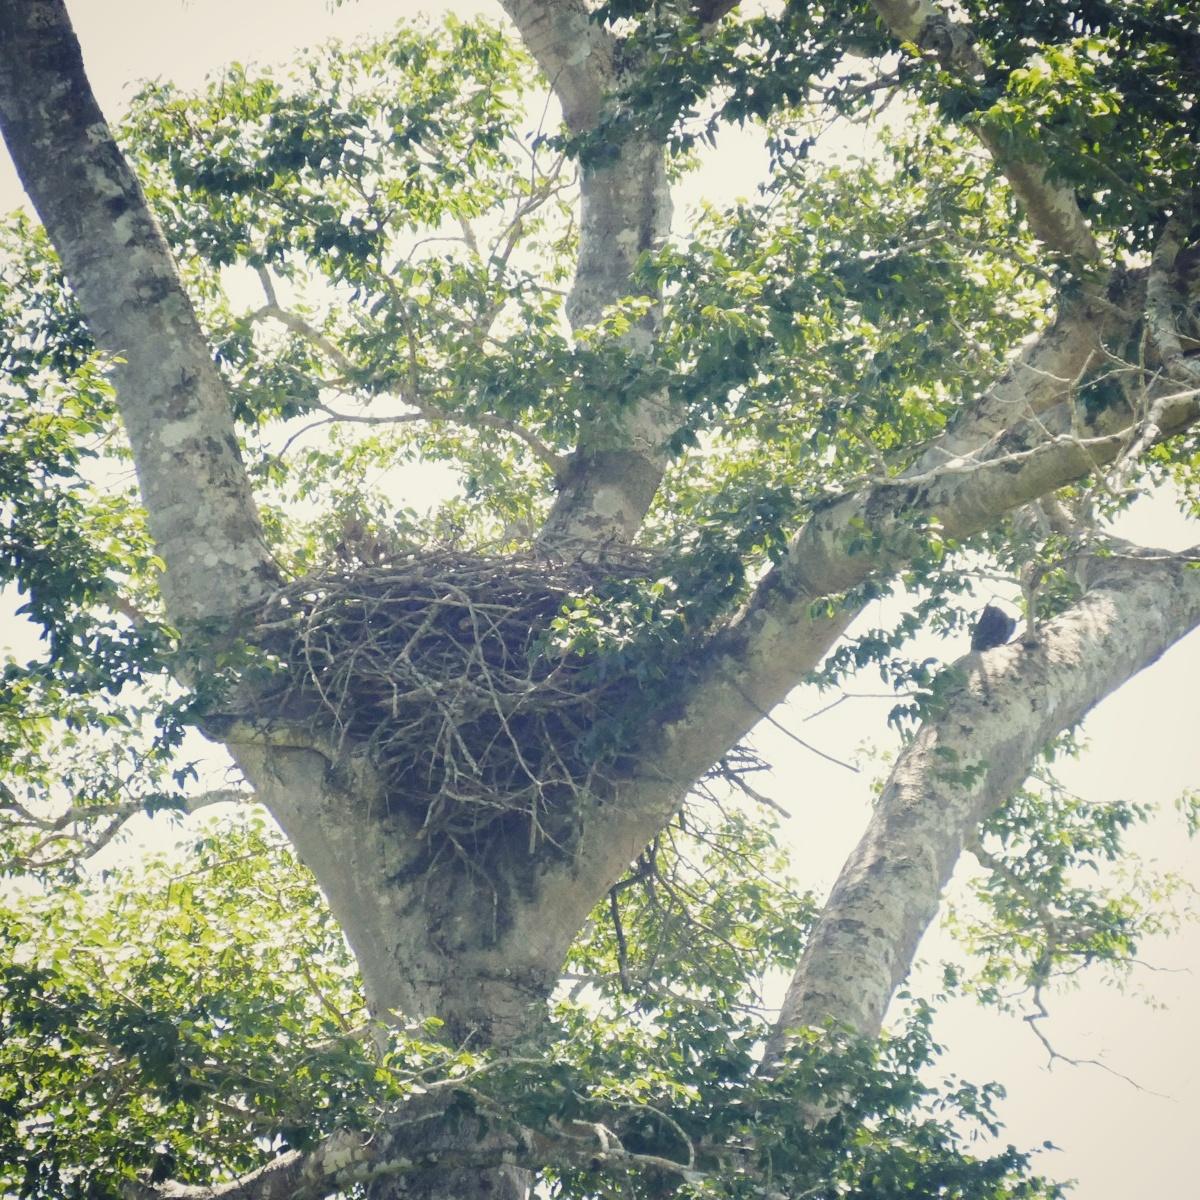 The empty Harpy Eagle nest. Credit: Noah Strycker